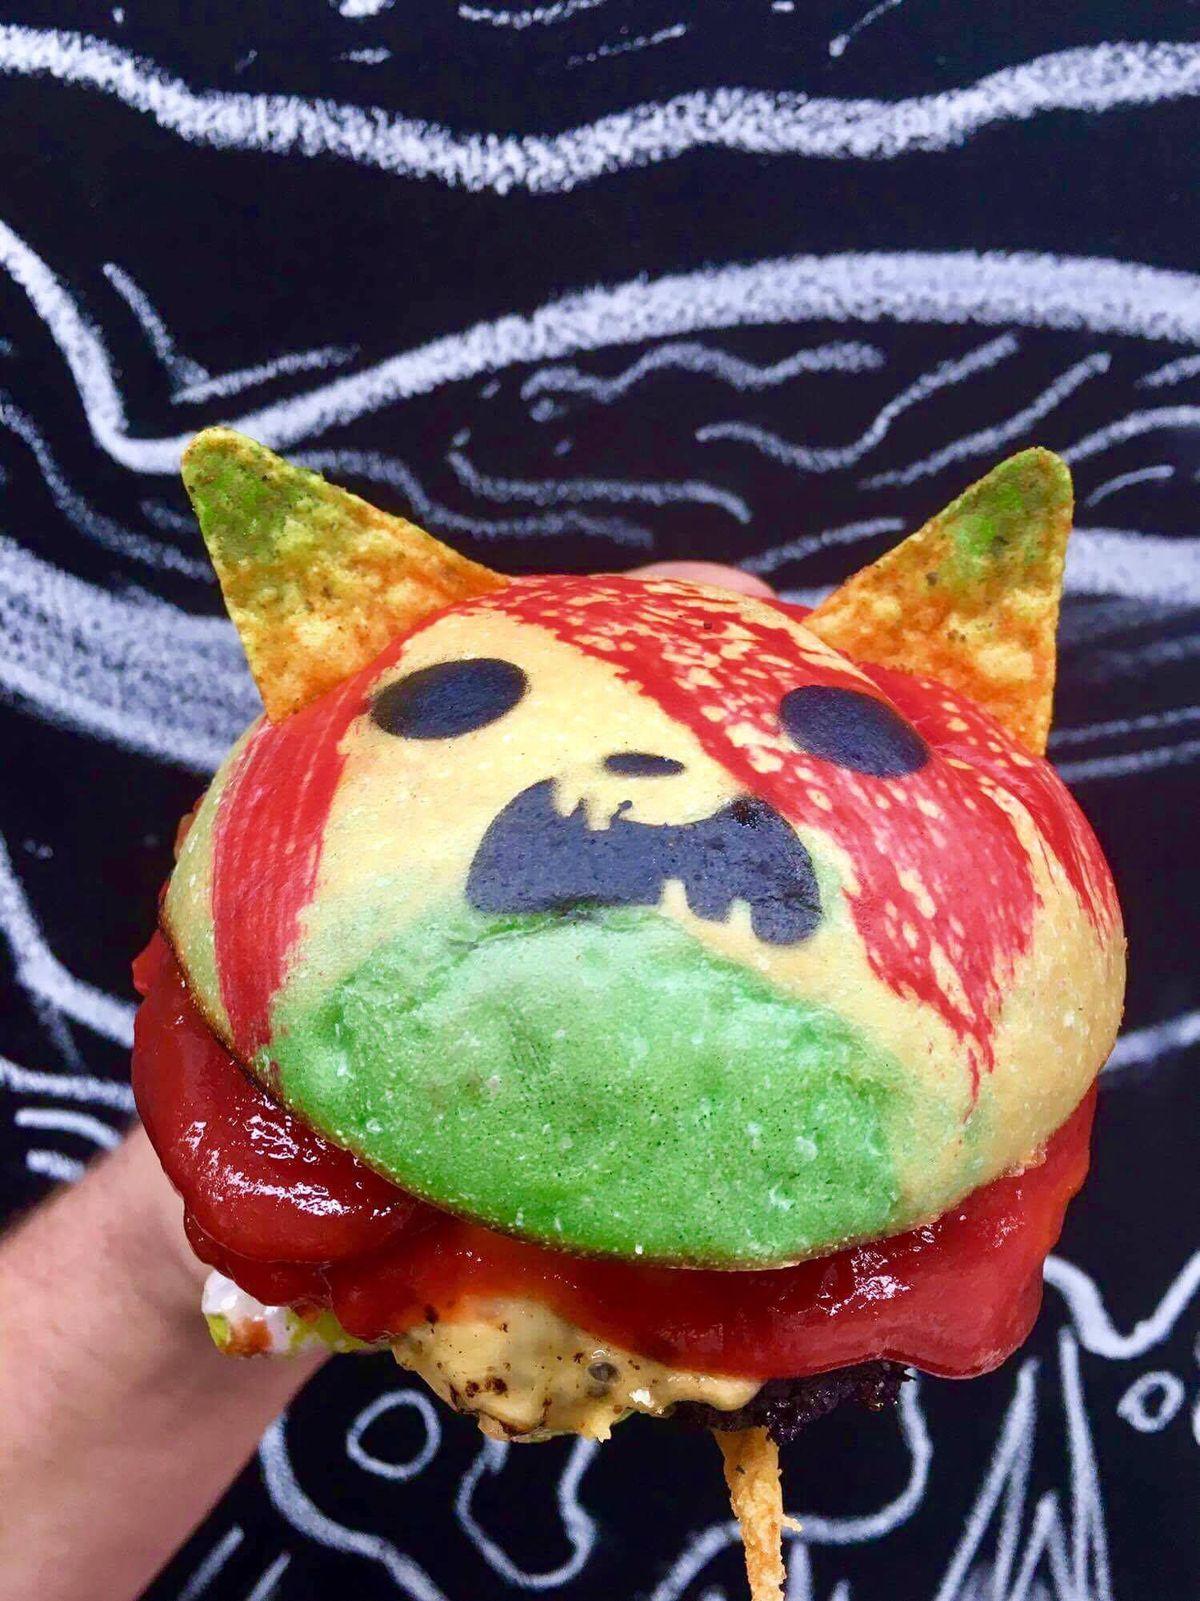 Zombie Pikachu Burgers